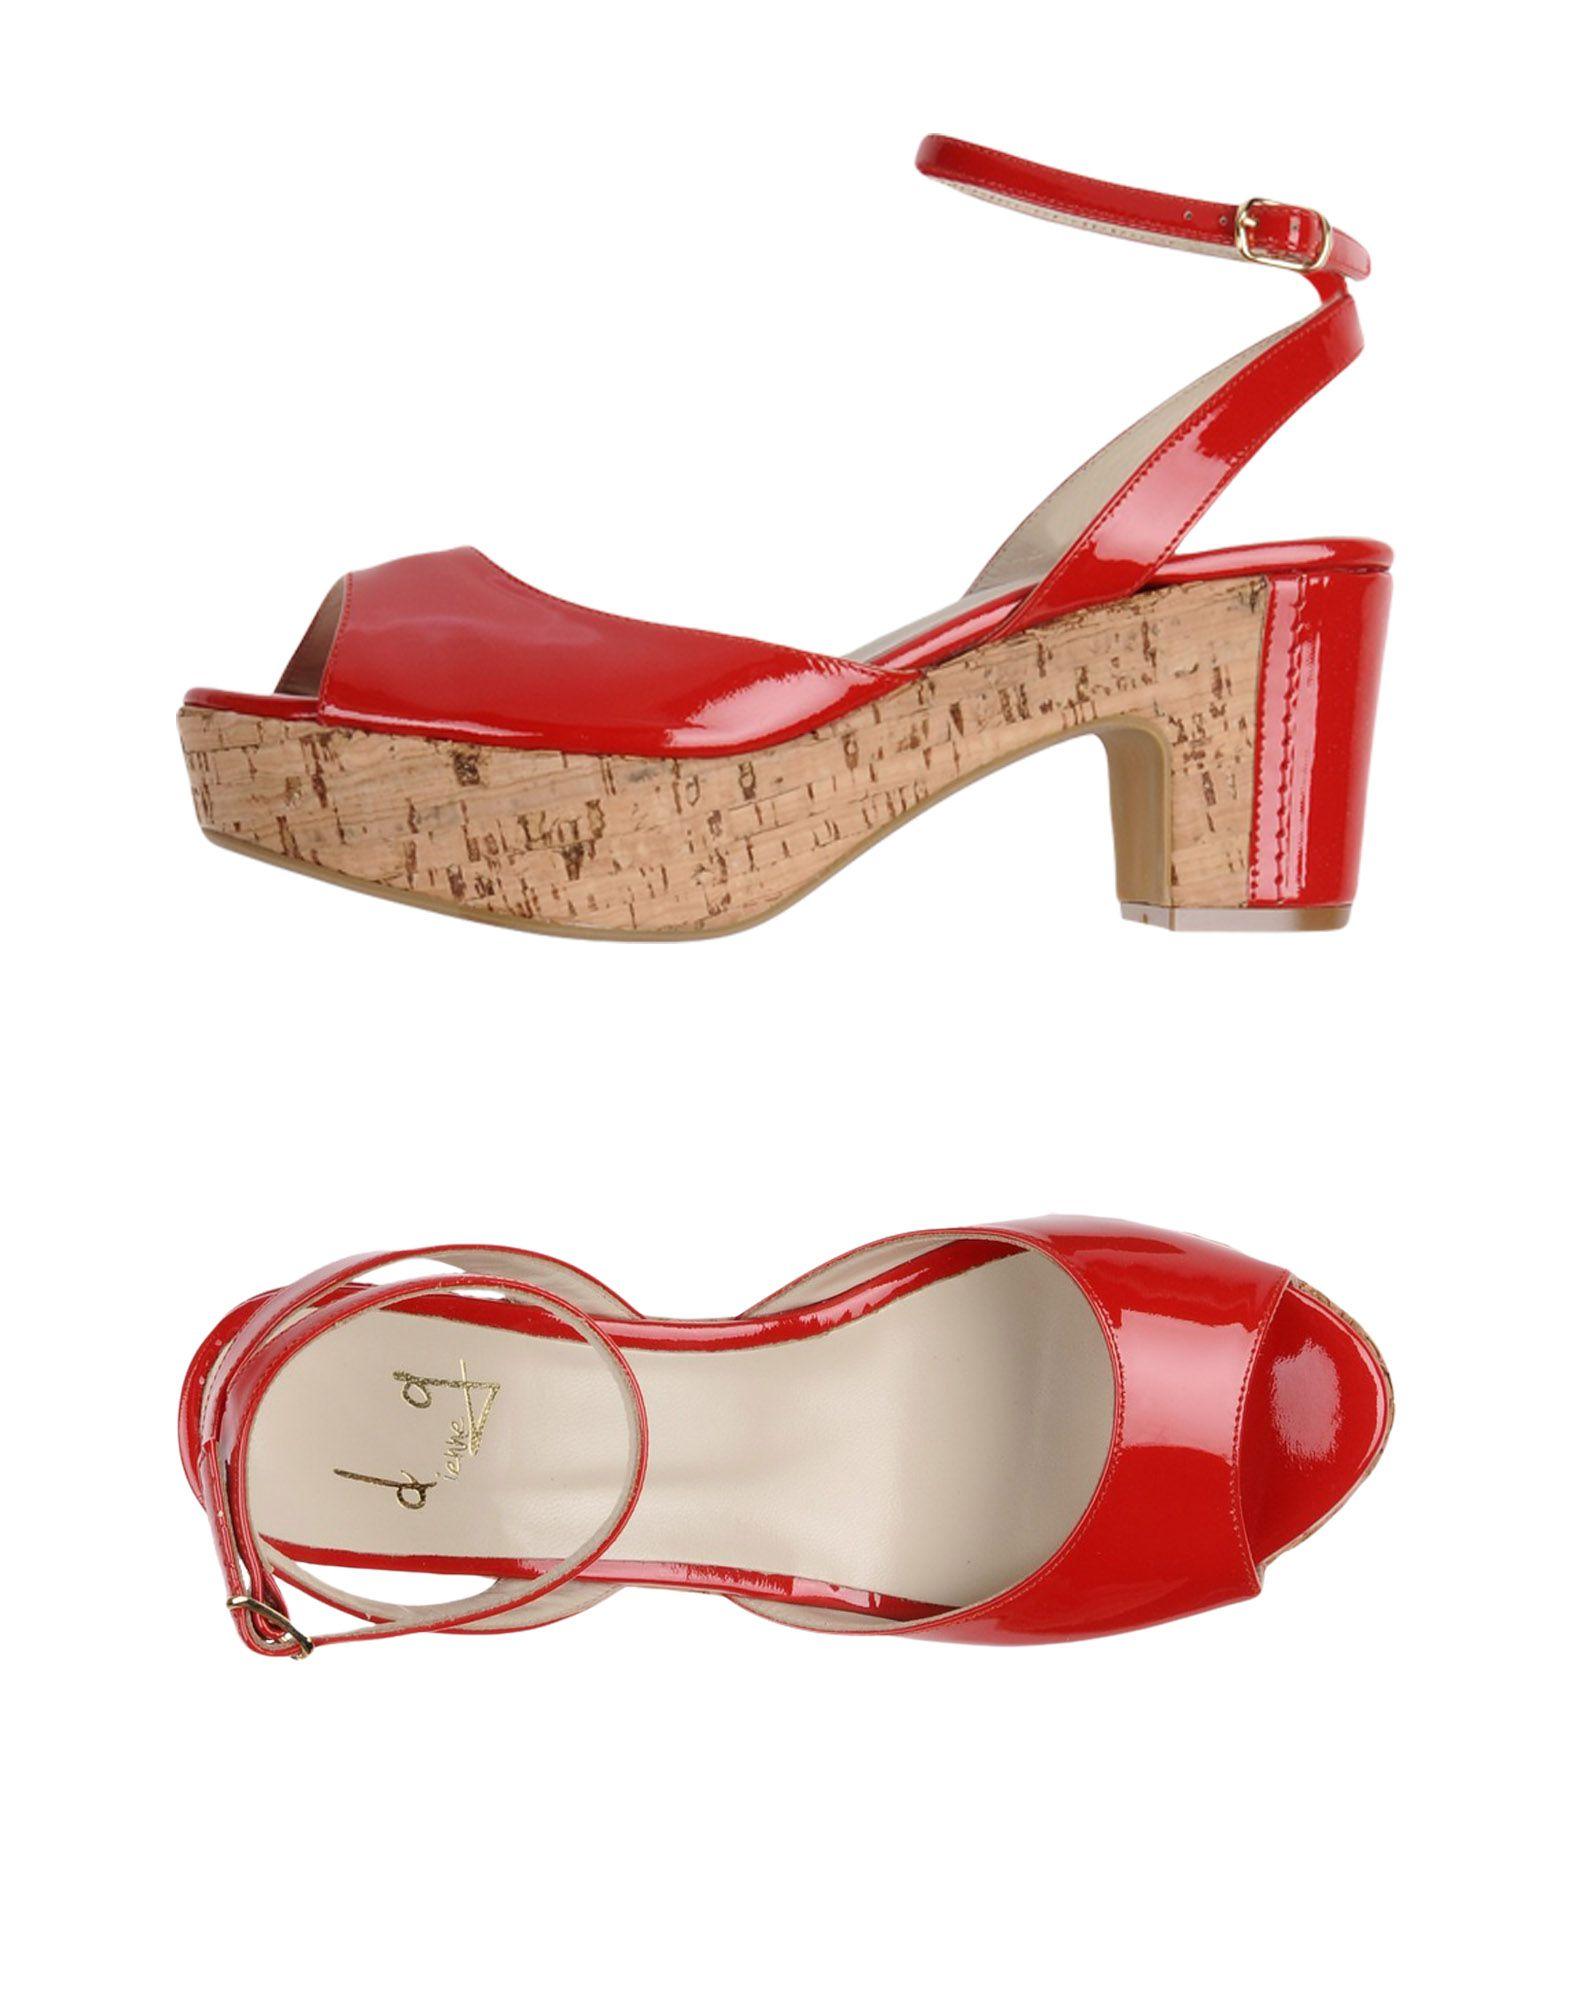 Dienneg Sandals - Women 11173670DM Dienneg Sandals online on  Australia - 11173670DM Women d792c1